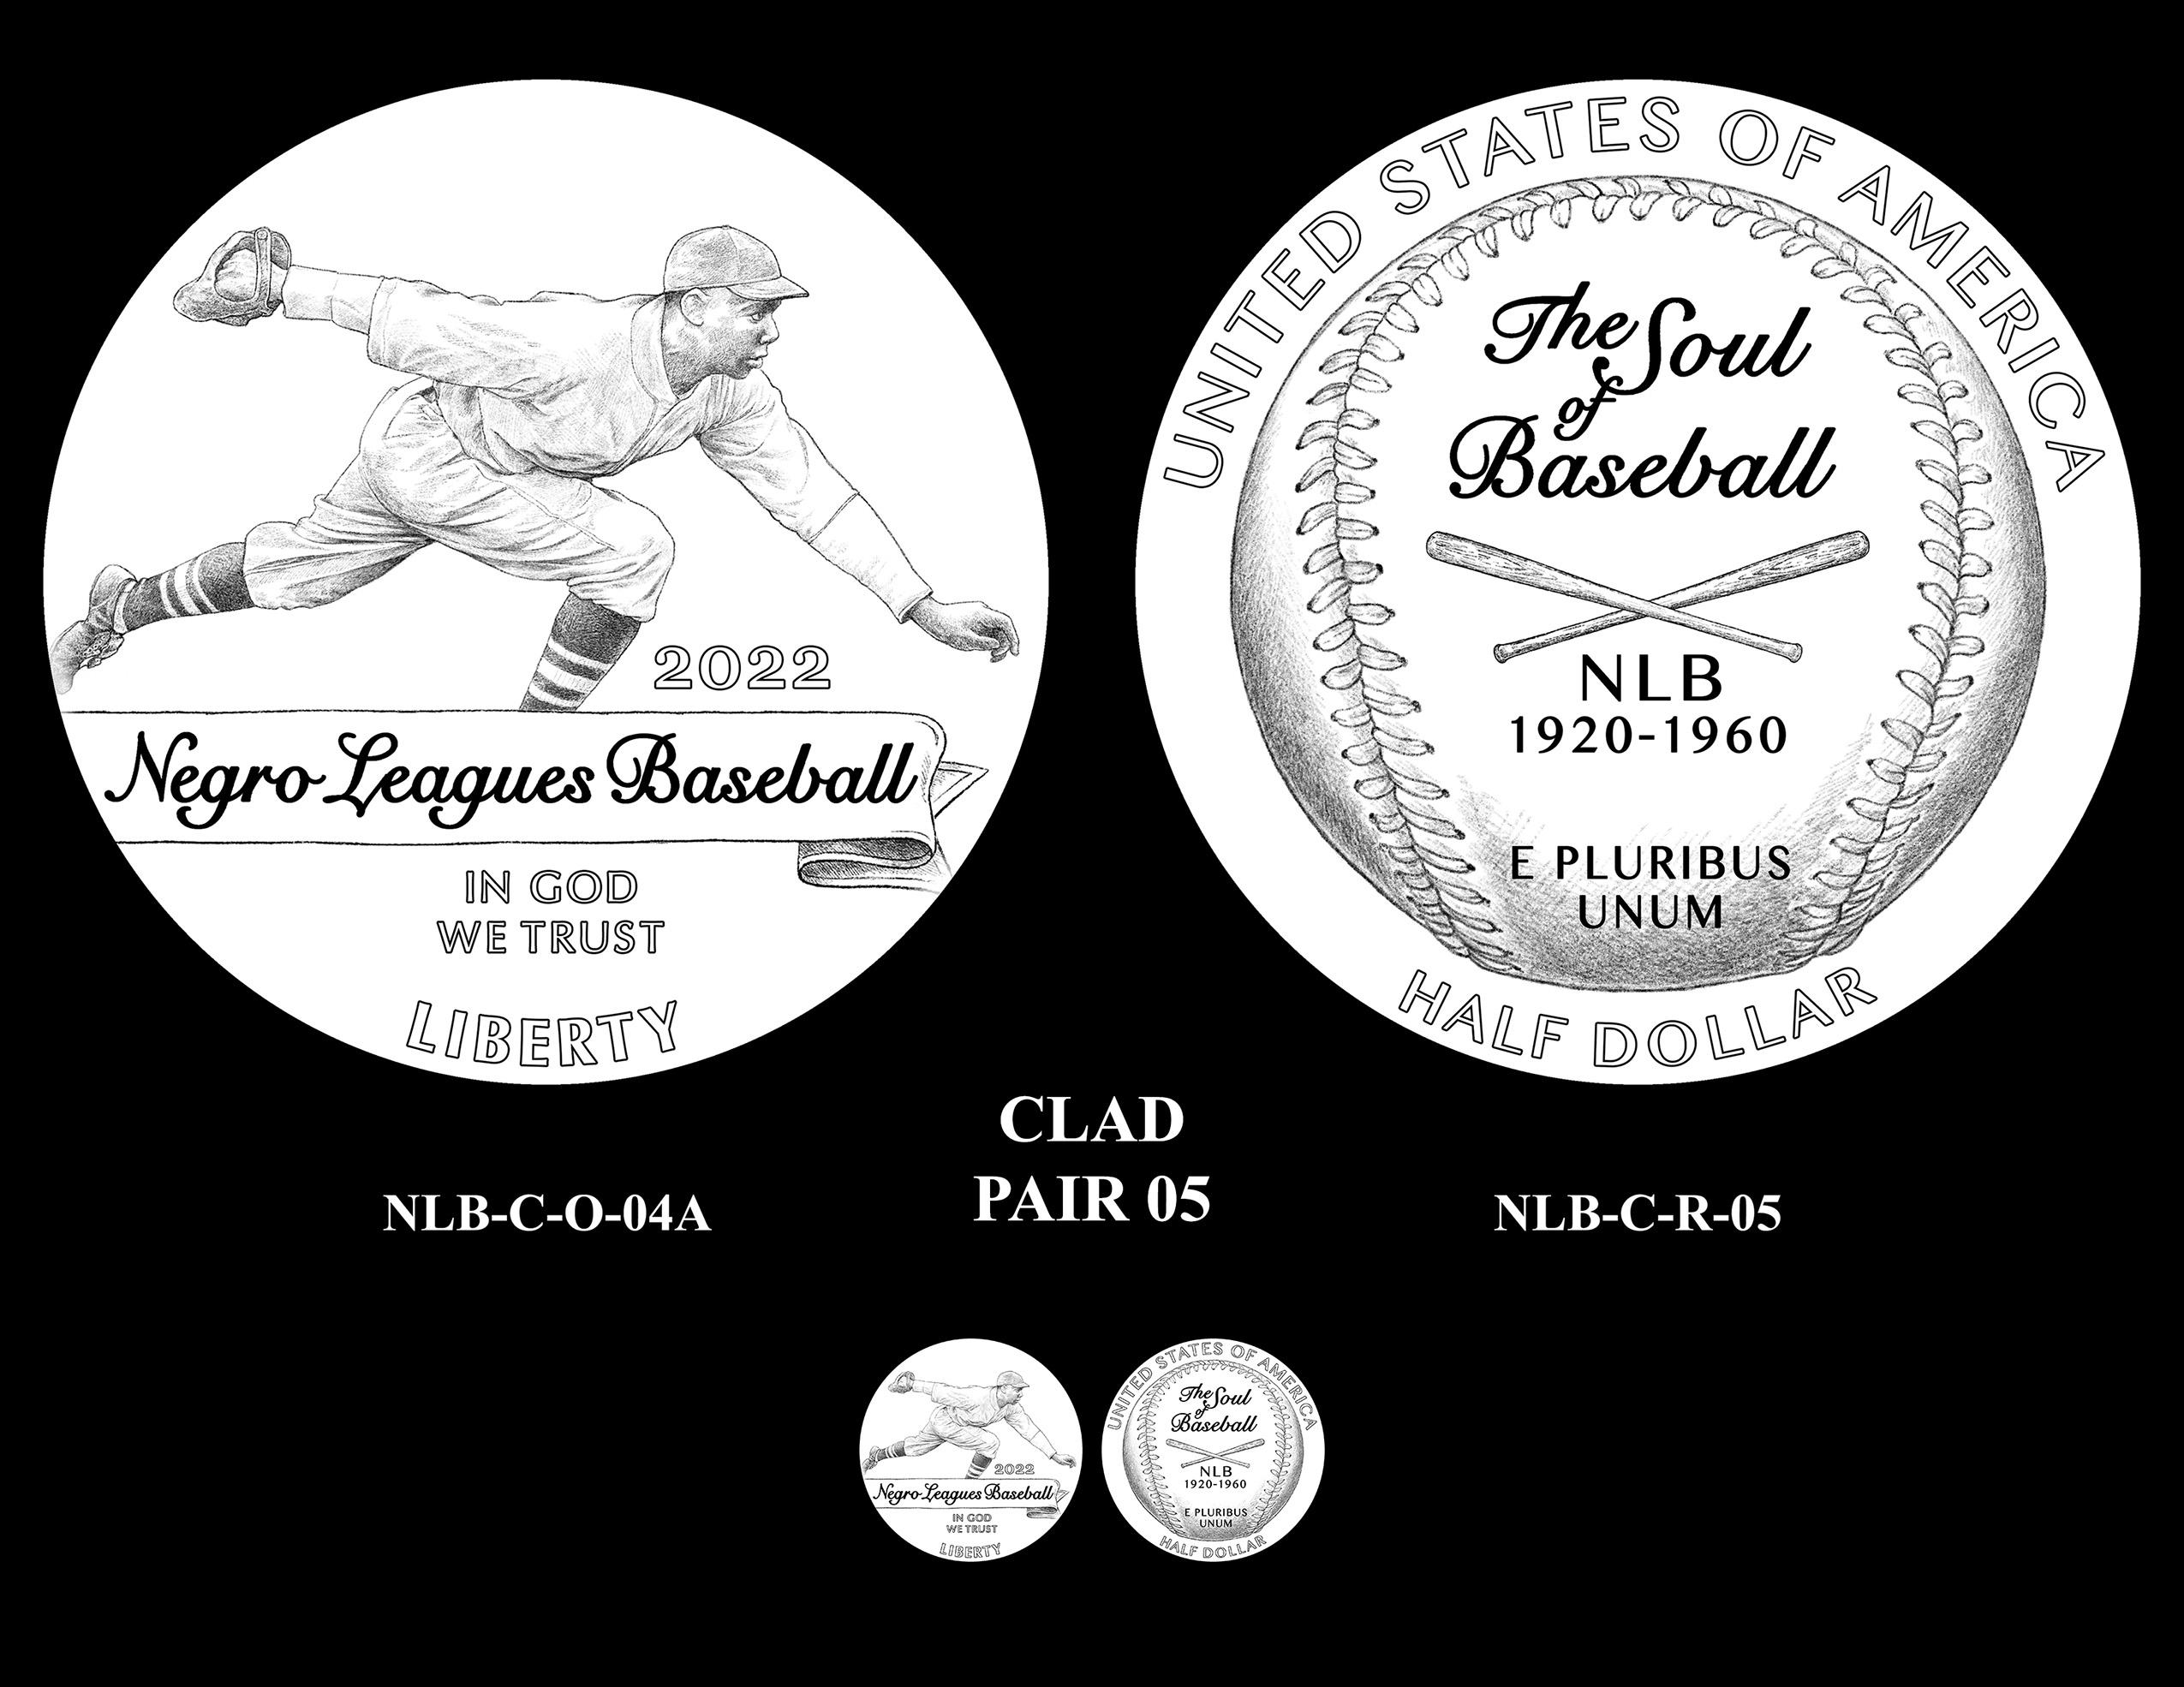 Clad Pair 05 -- Negro Leagues Baseball Commemorative Coin Program